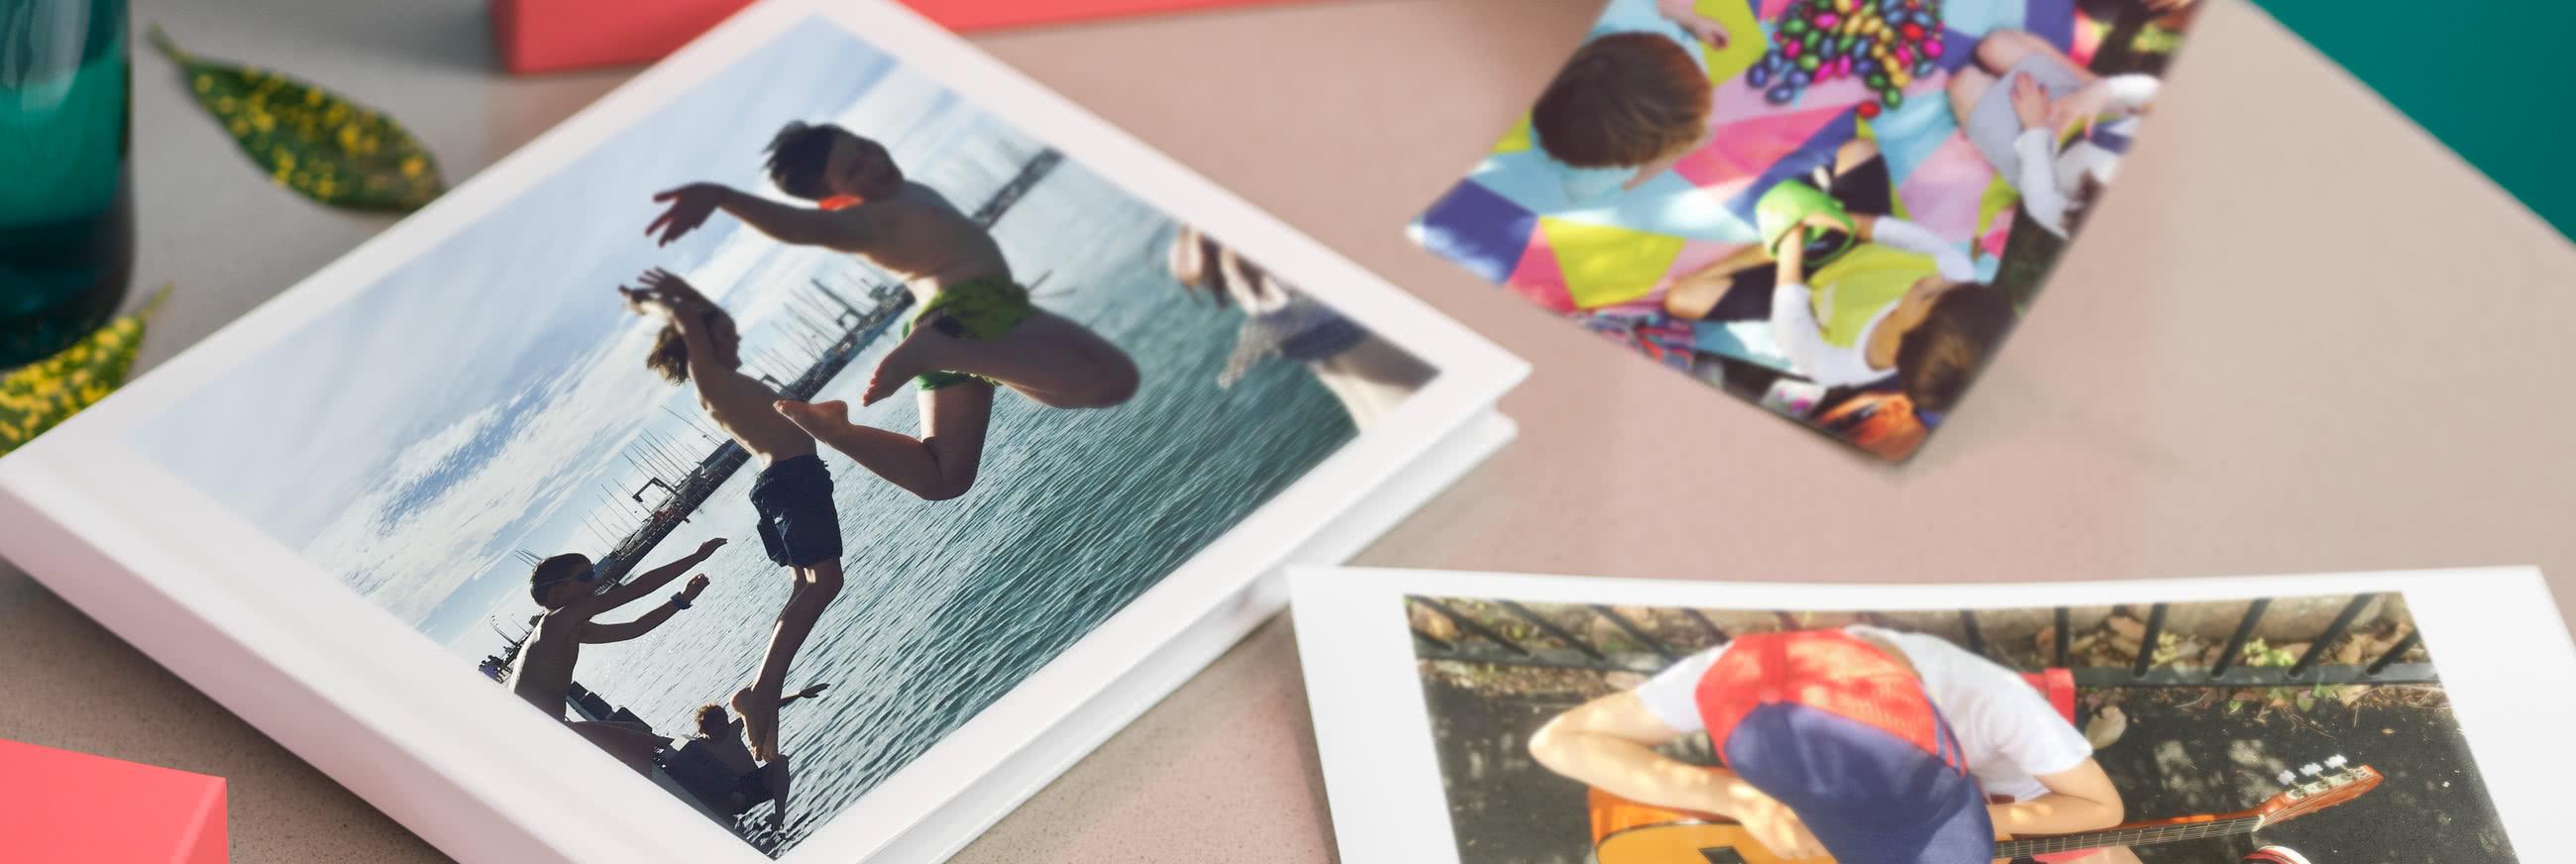 A4 Premium Hardcover Pro Lay Flat Photo Books